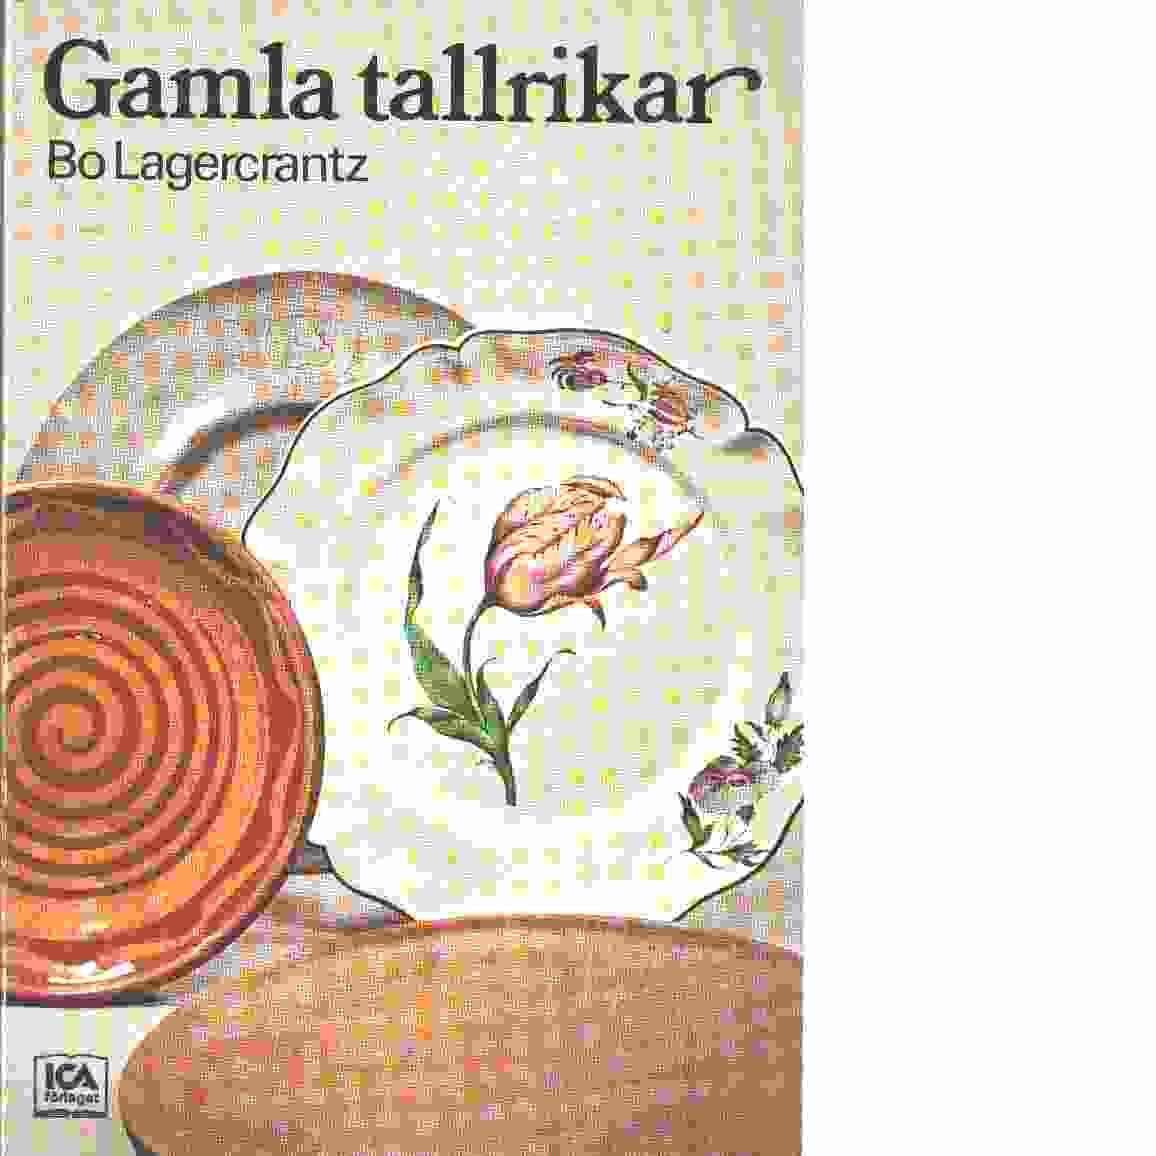 Gamla tallrikar : ur tallrikens historia - Lagercrantz, Bo